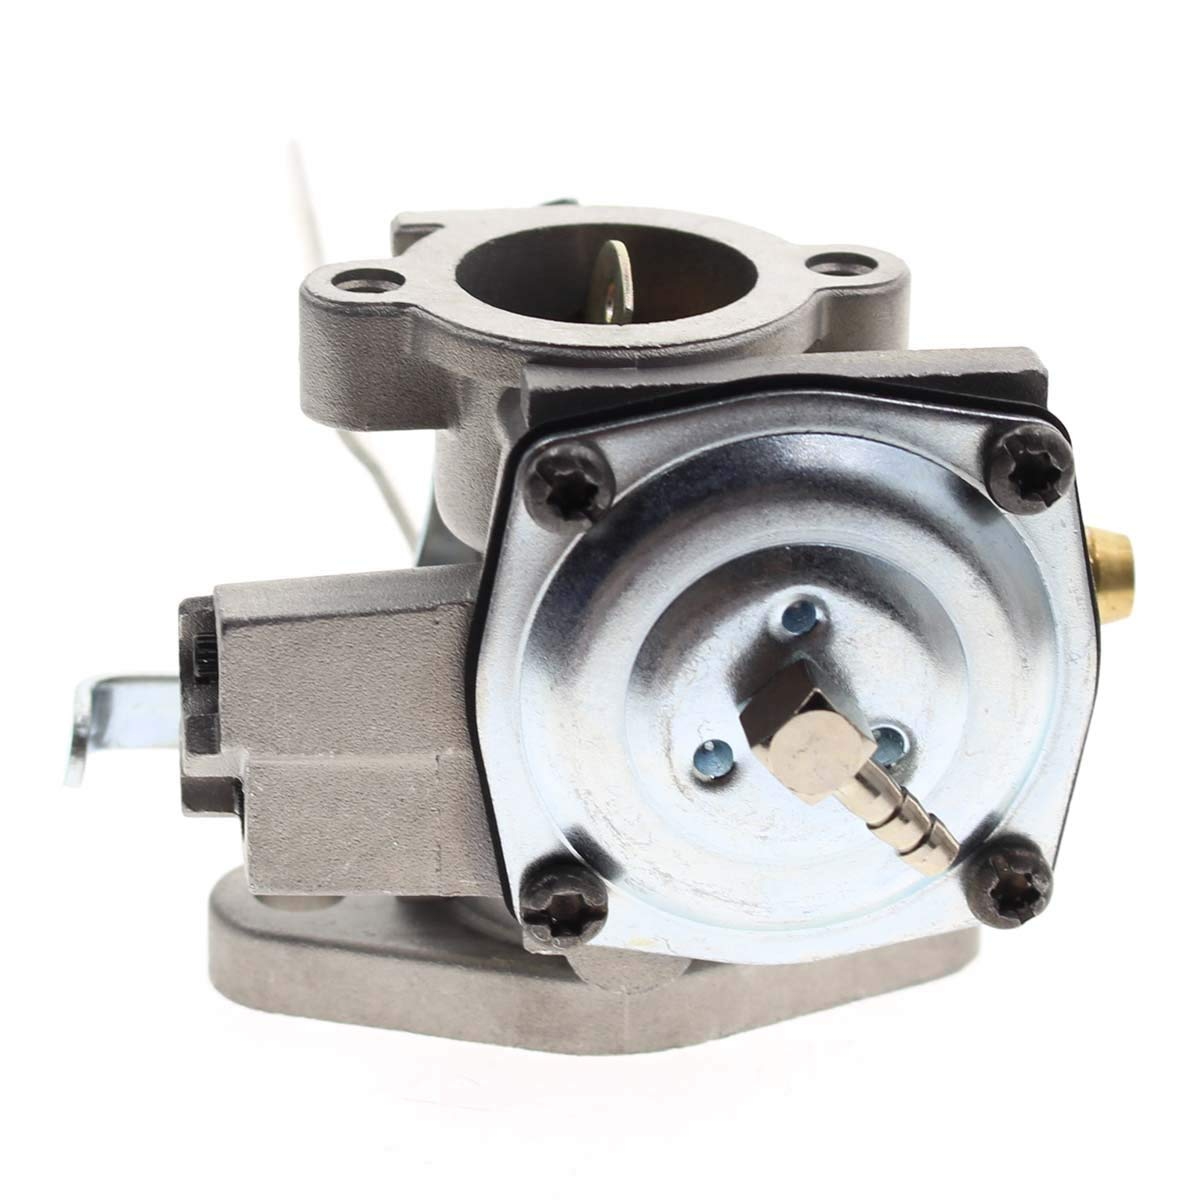 Triumilynn Carburetor for Tecumseh AV520 TV085XA 2-Cycle Vertical Engine Motor Replaces #640263 631720A 640290 Carb HAOCHENG